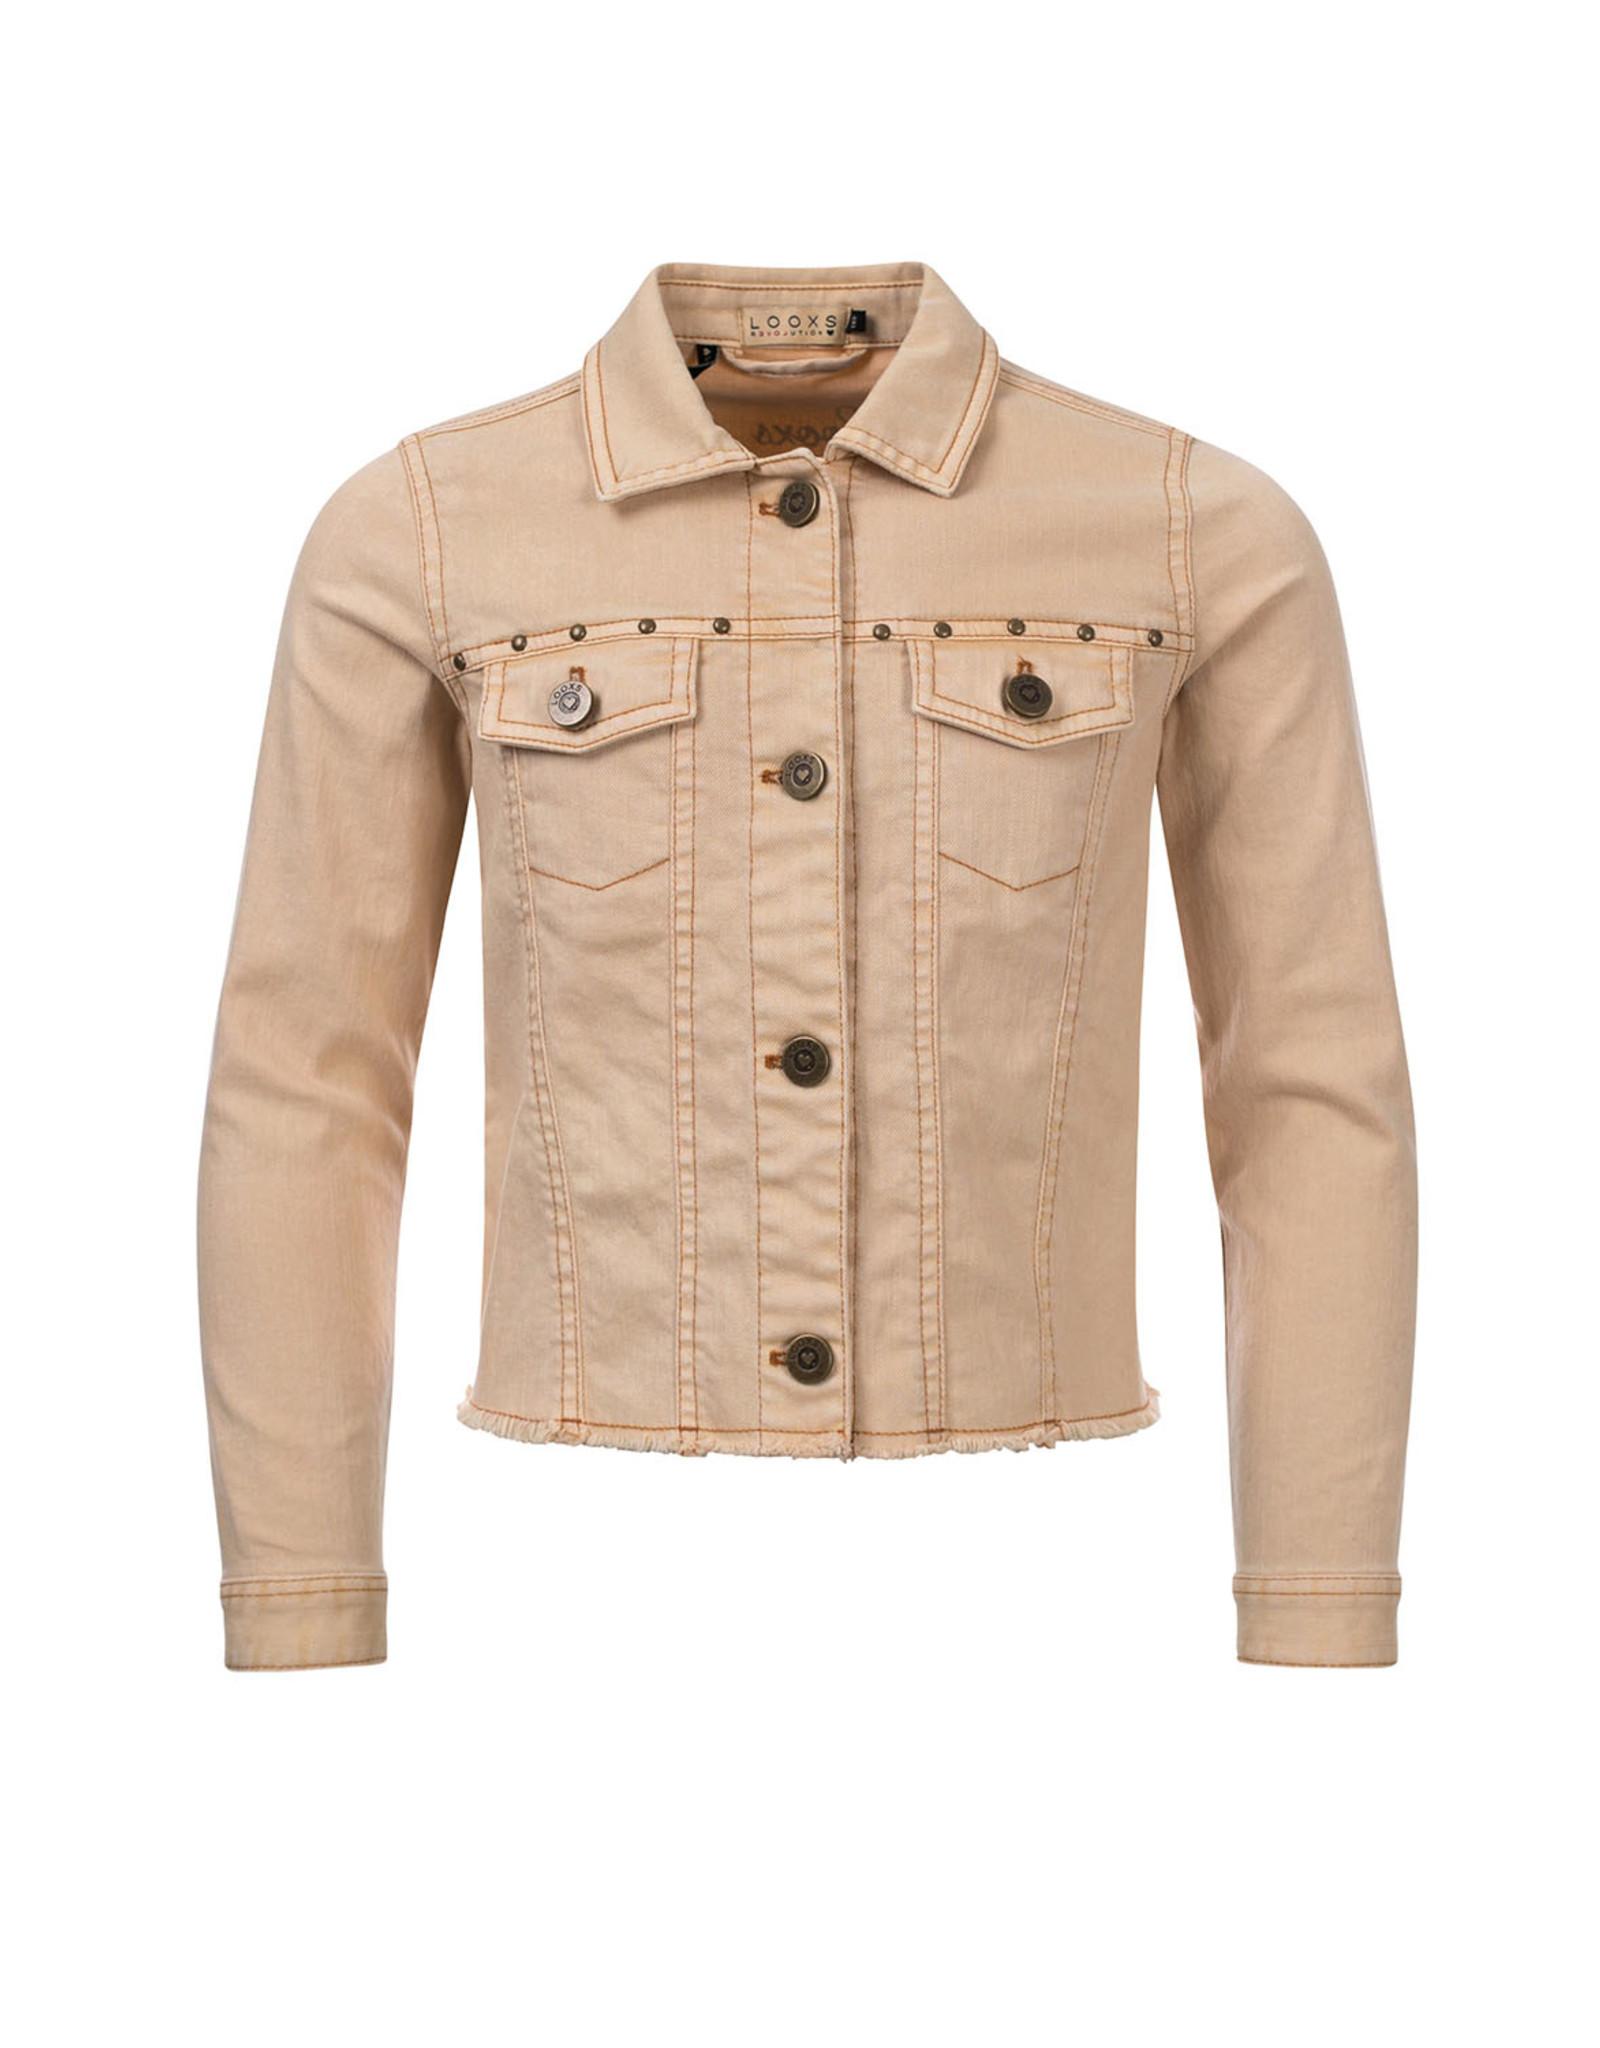 LOOXS 10sixteen Oversized Jacket